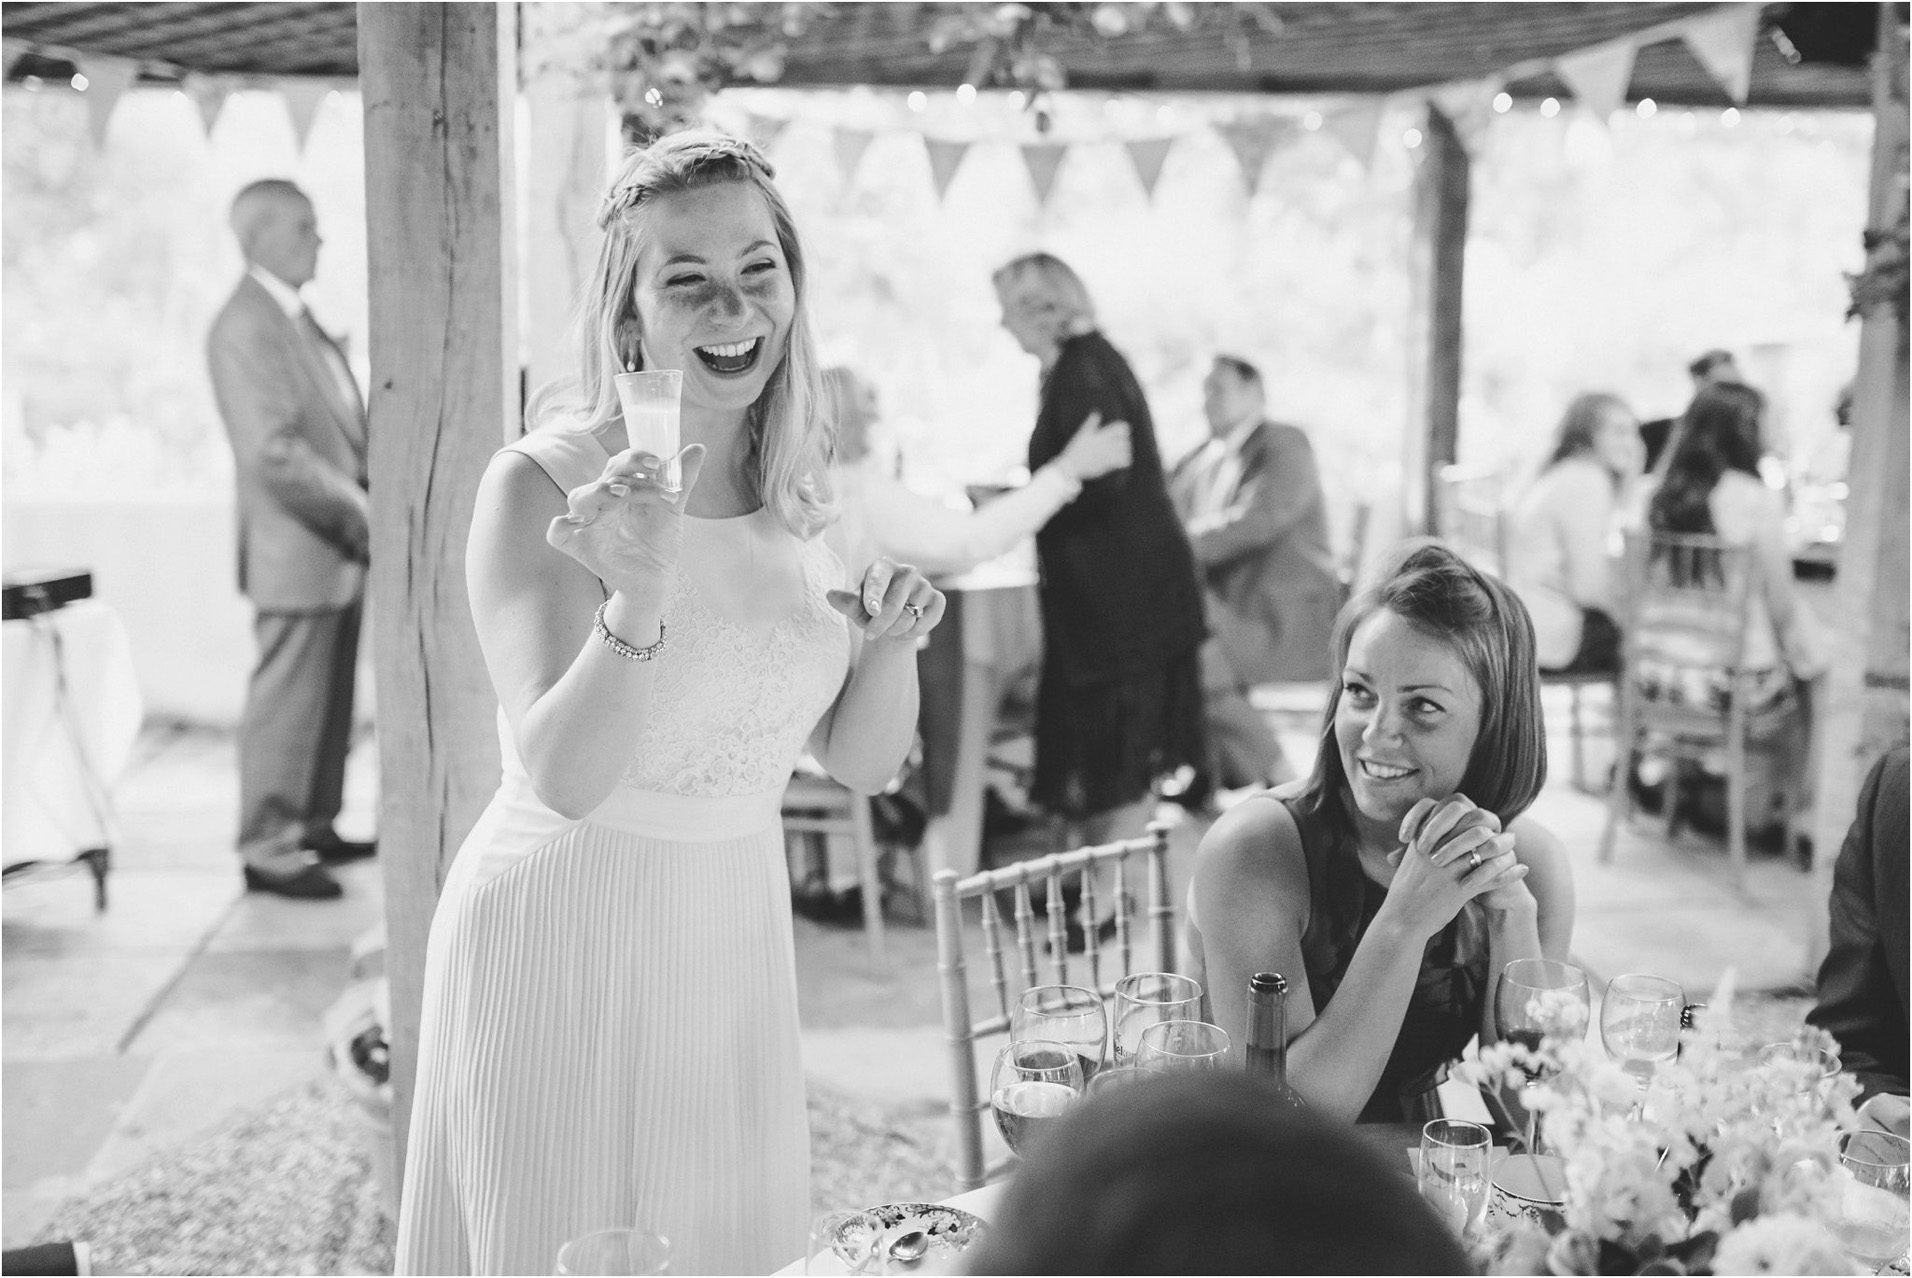 Simon biffen wedding photography 0126